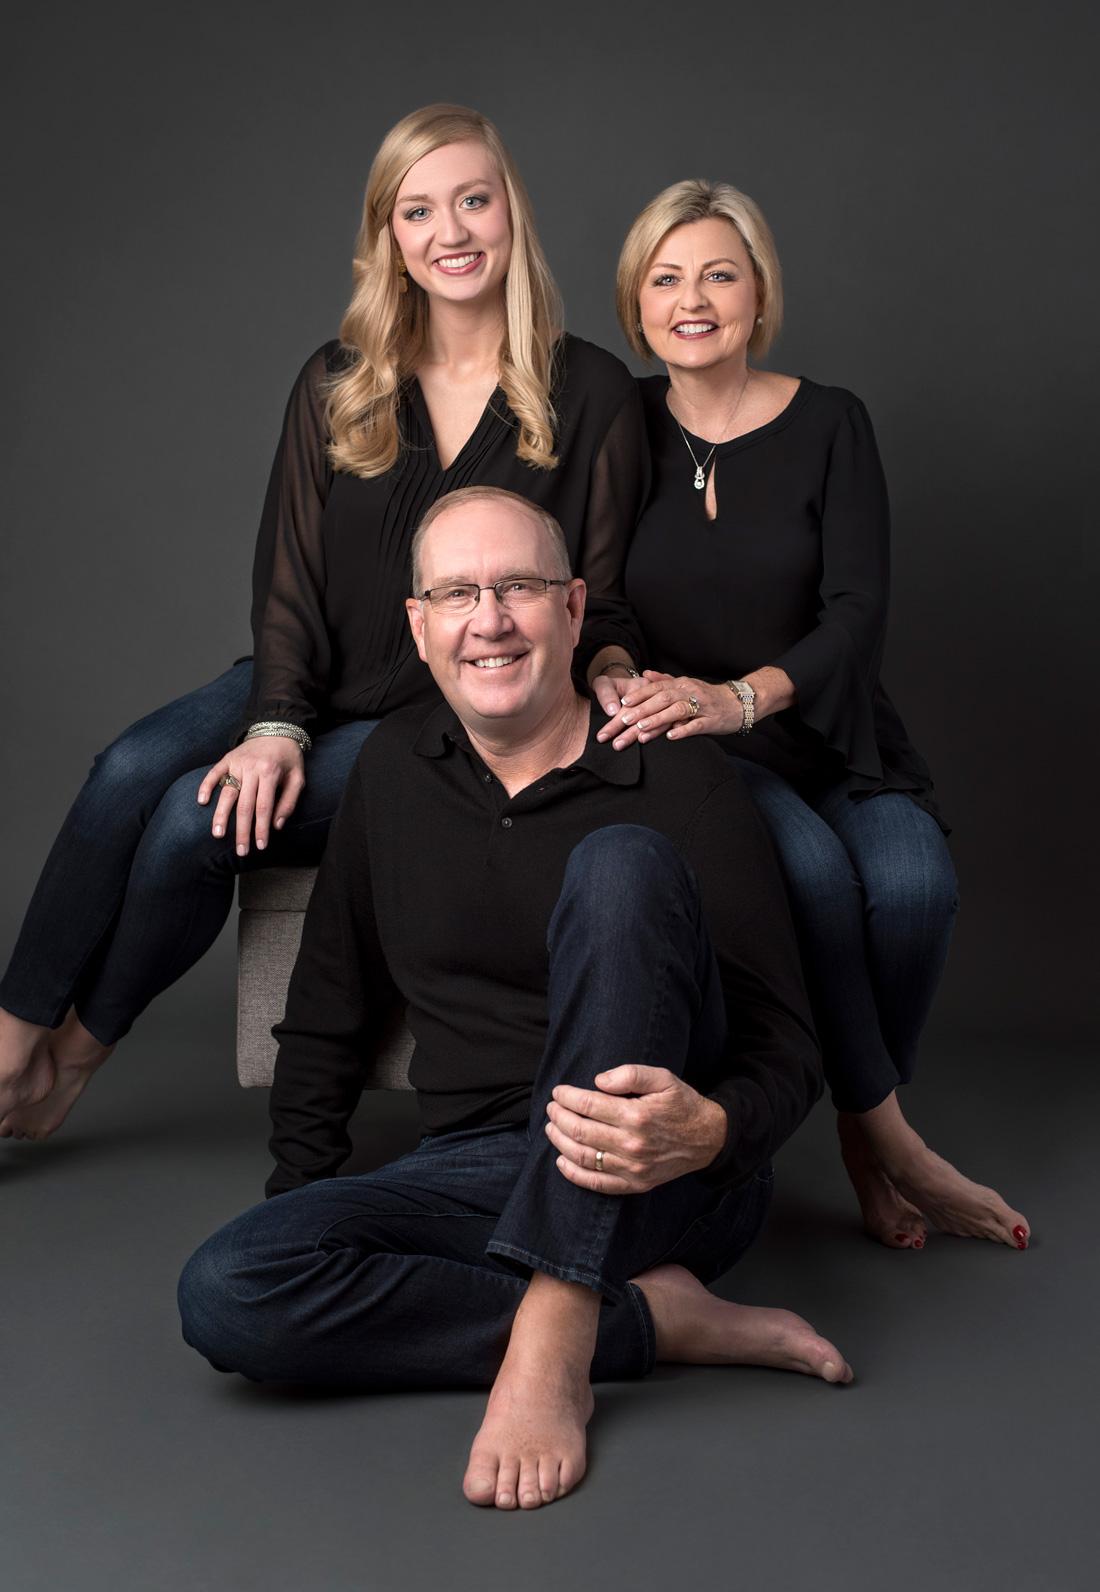 Heights-Studio-Family-Portraits (2).jpg